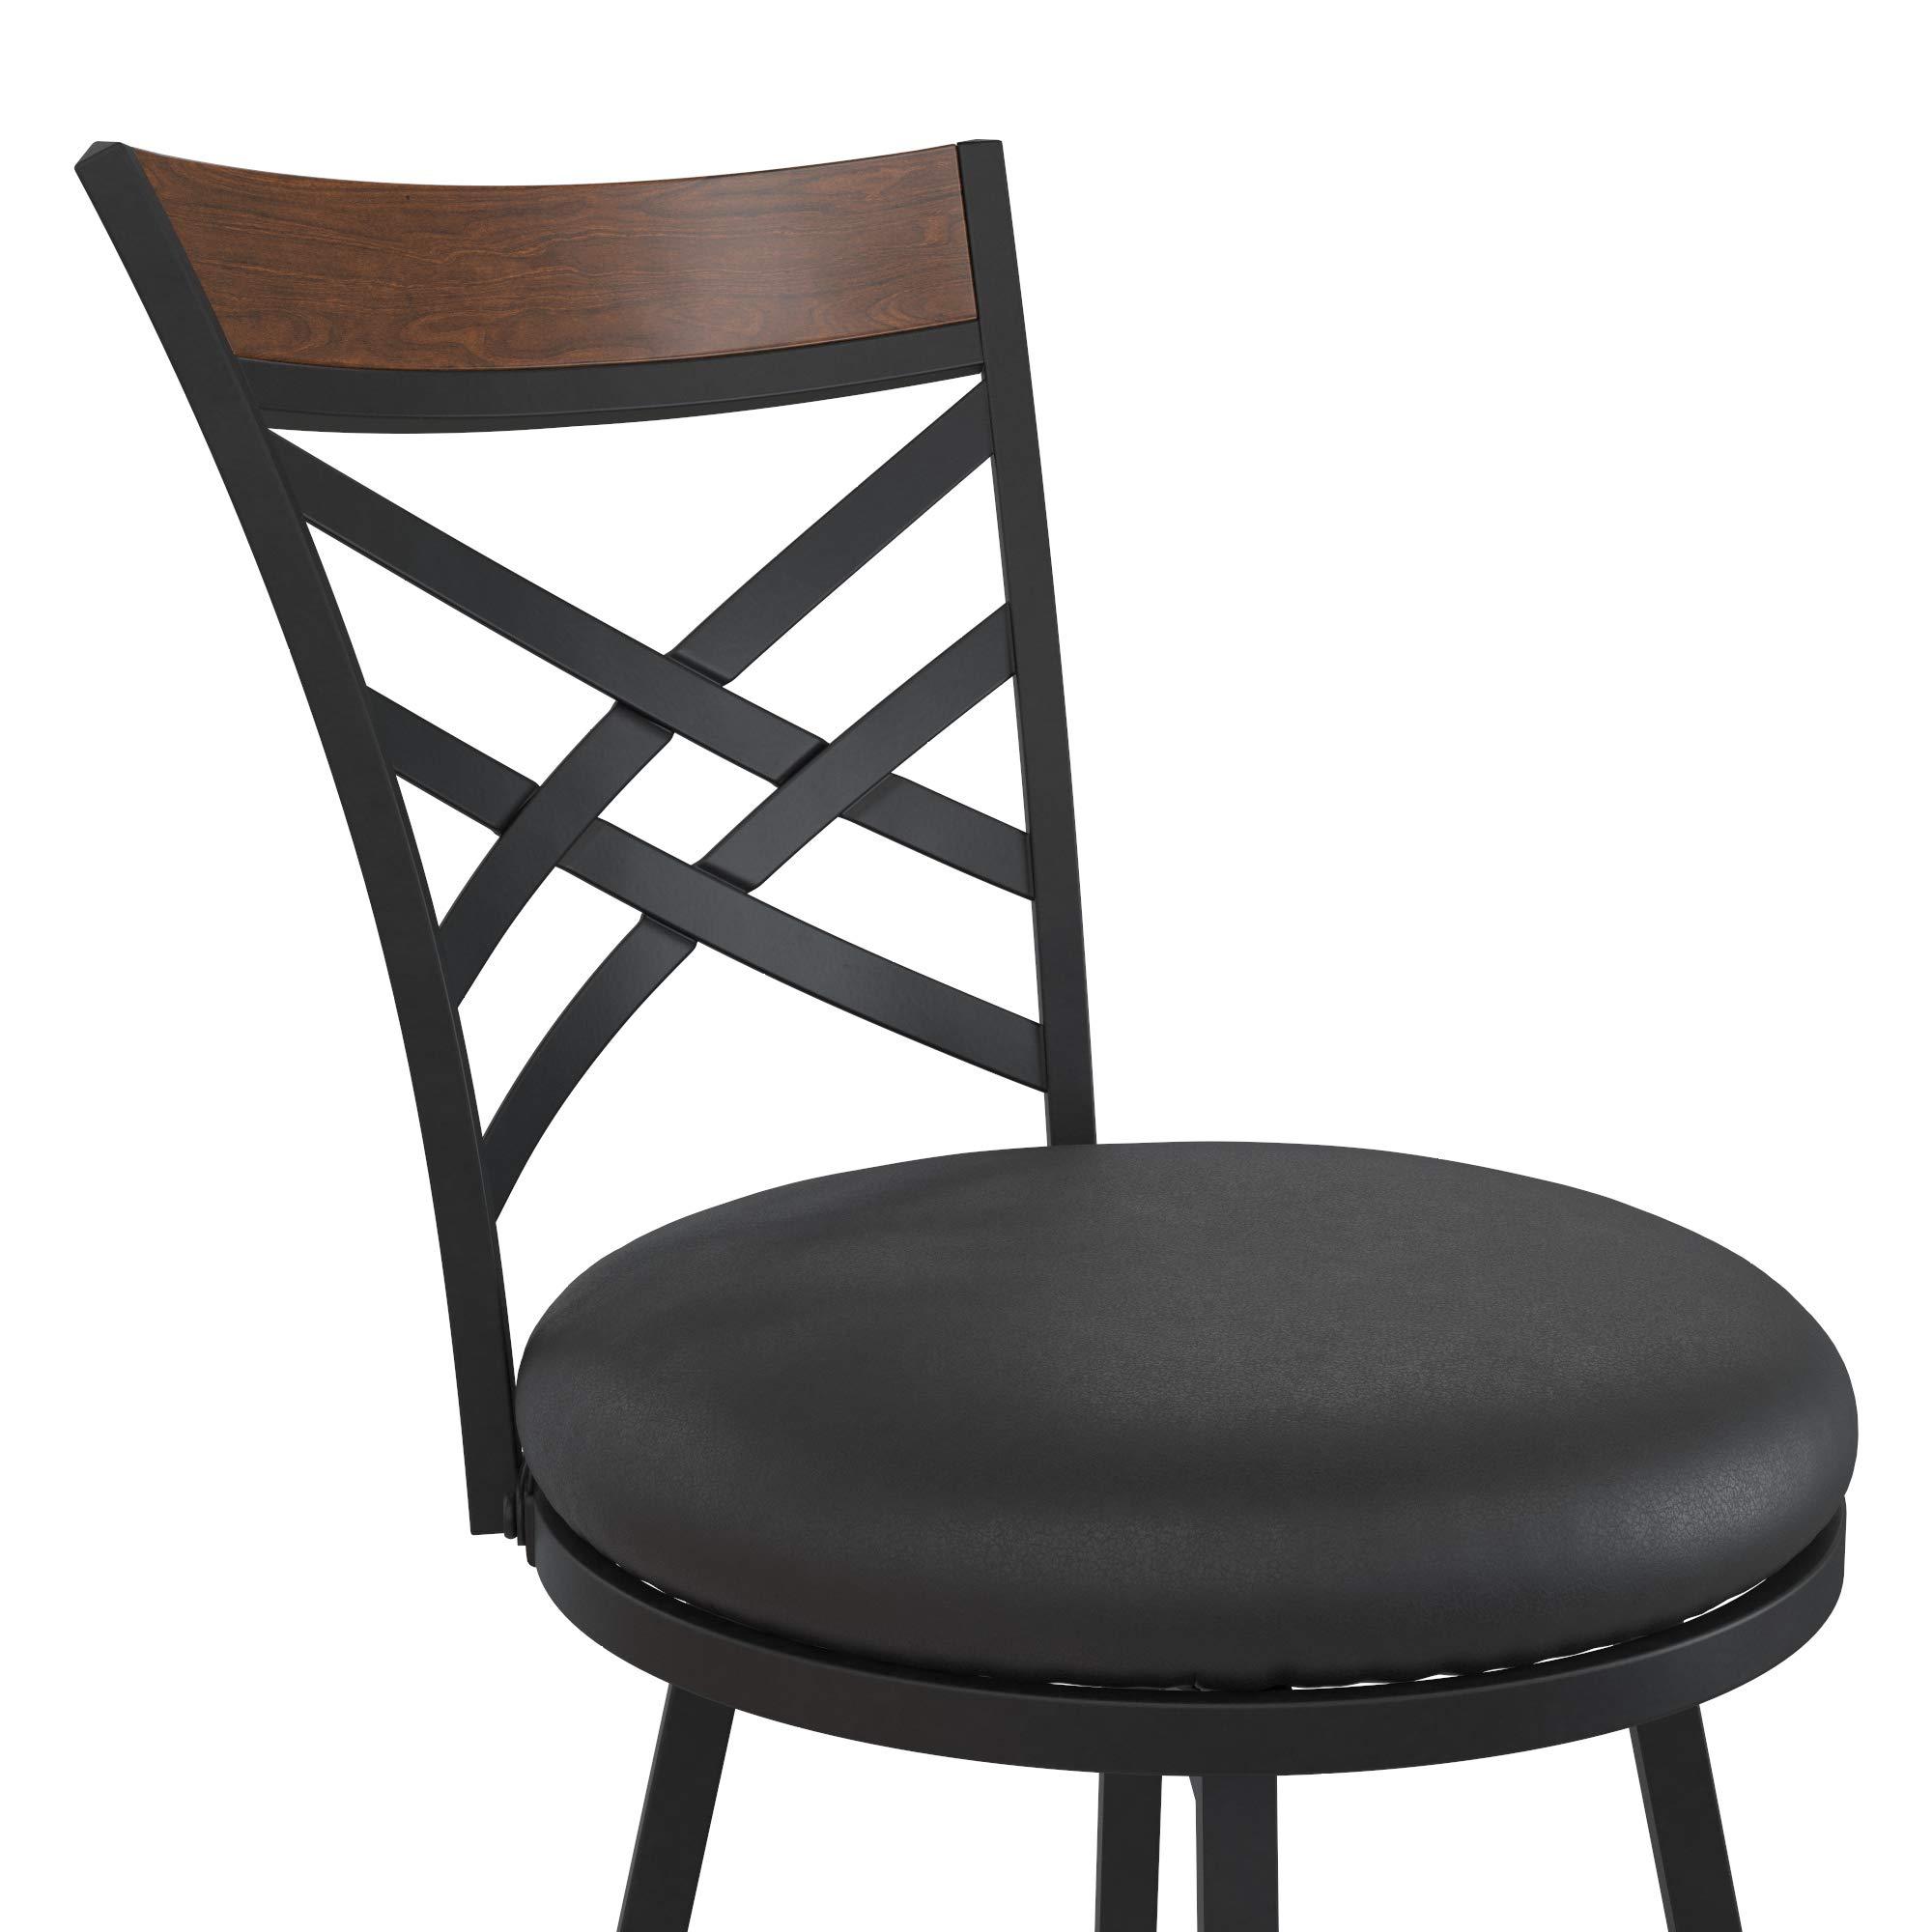 Set of 3 Barstool Tan Microfiber DHP Alfie Upholstered Seat Swivel